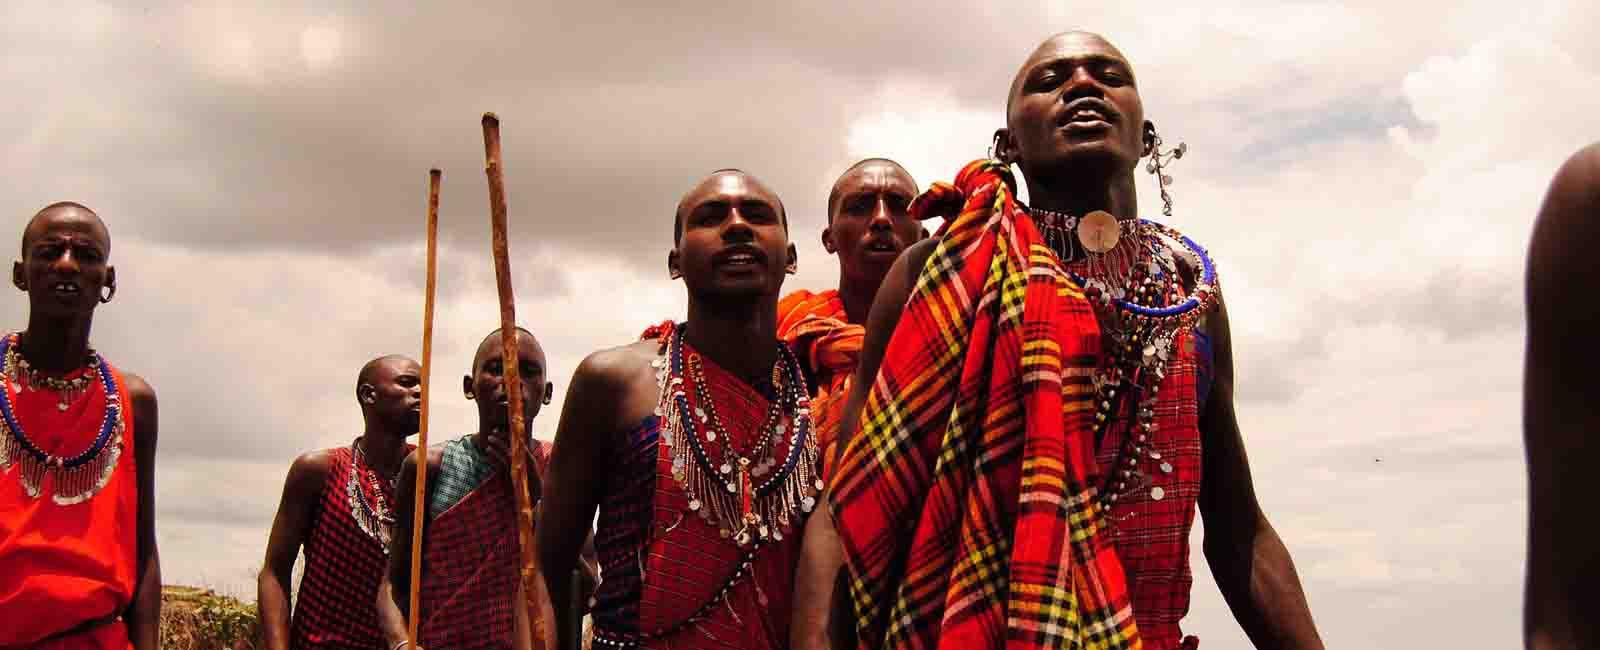 , Masai Mara